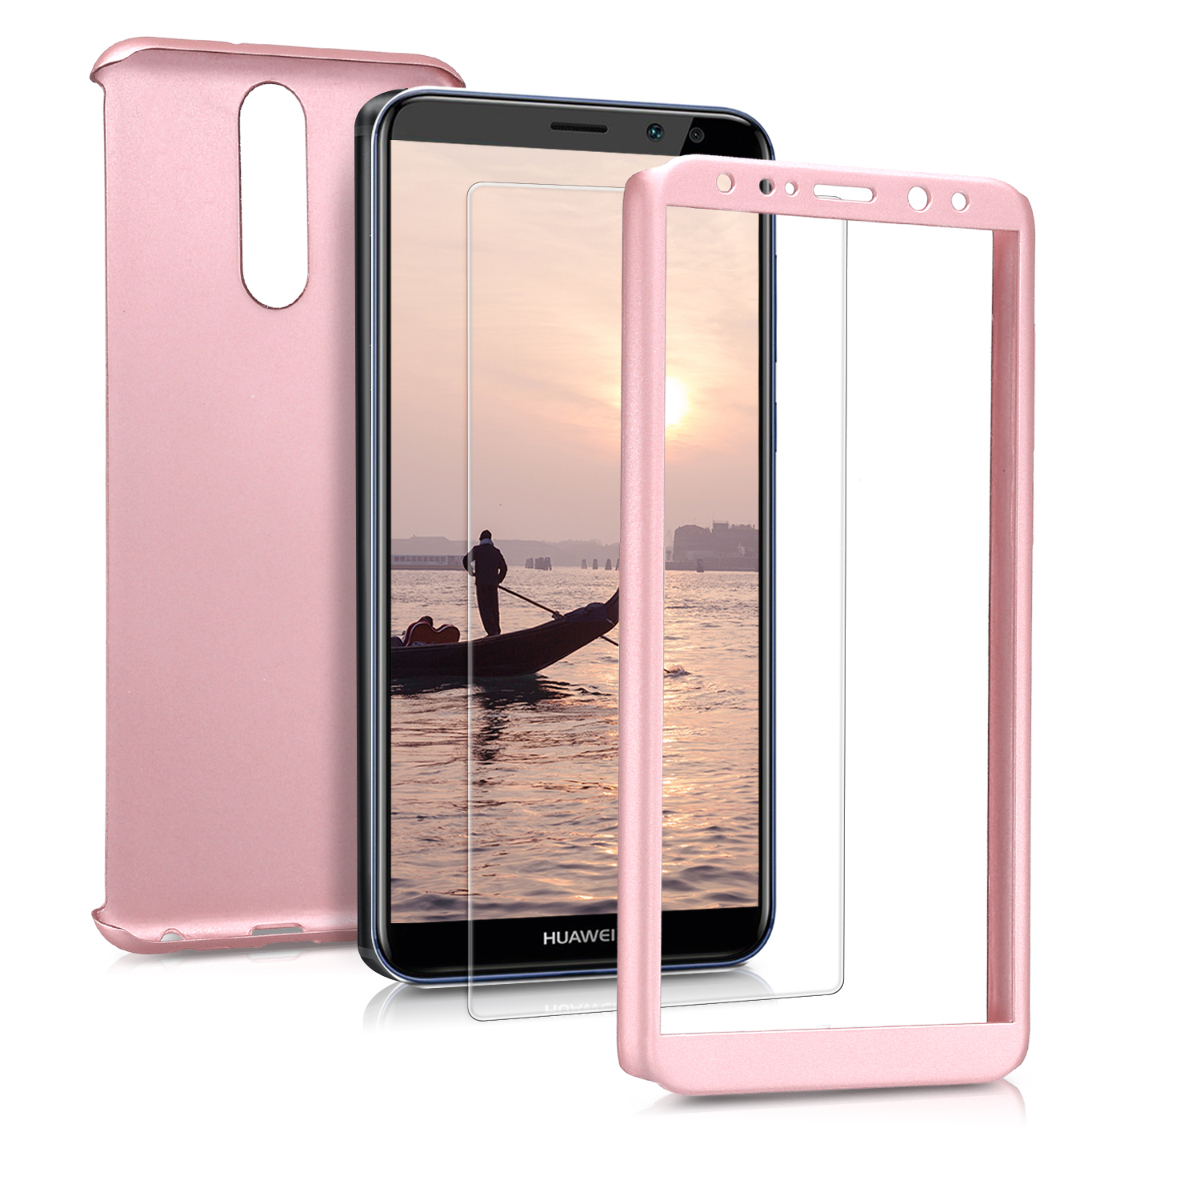 KW Θήκη Full Body Huawei Mate 10 Lite & Tempered Glass - Μεταλλικό ροζ χαλκινο (44968.31)